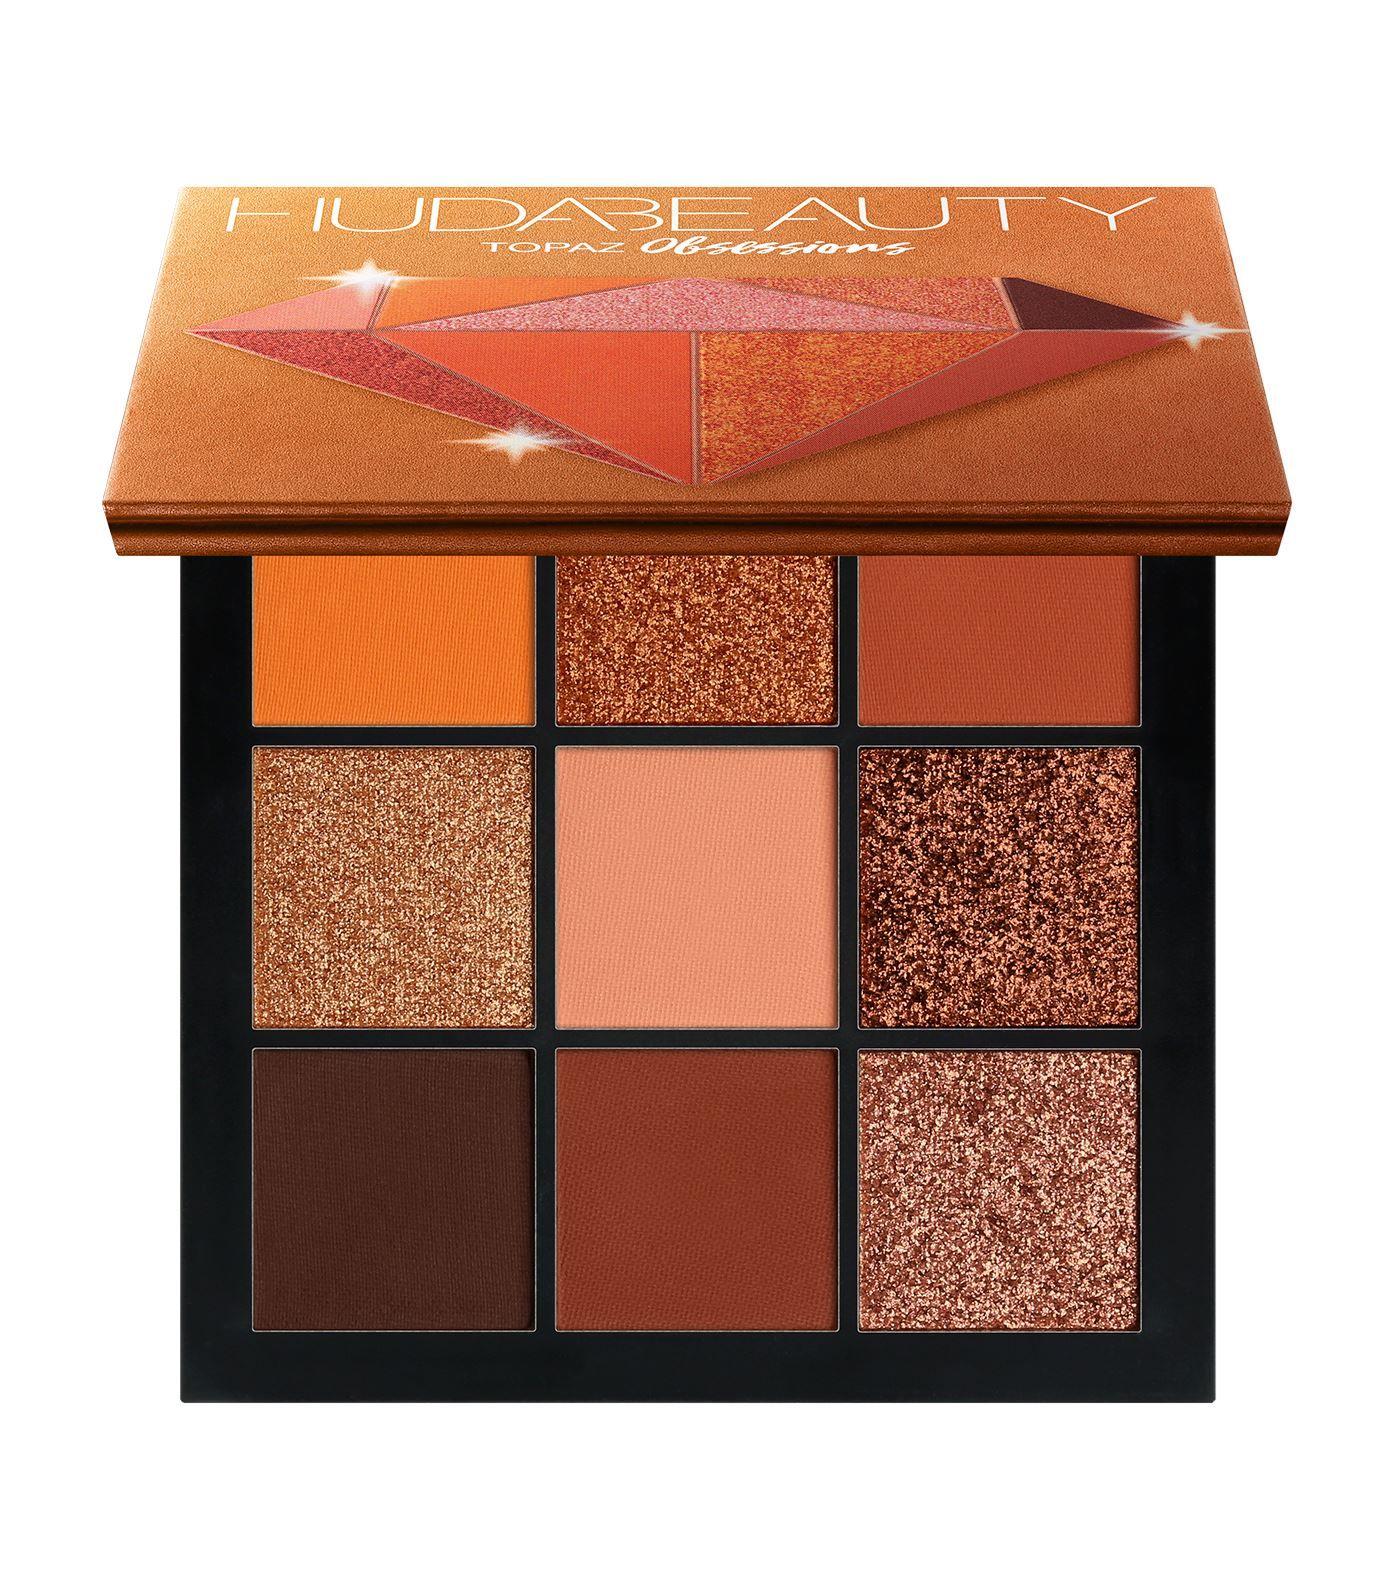 Photo of Huda Beauty Topaz Obsessions Eye Shadow Palette | Harrods.com